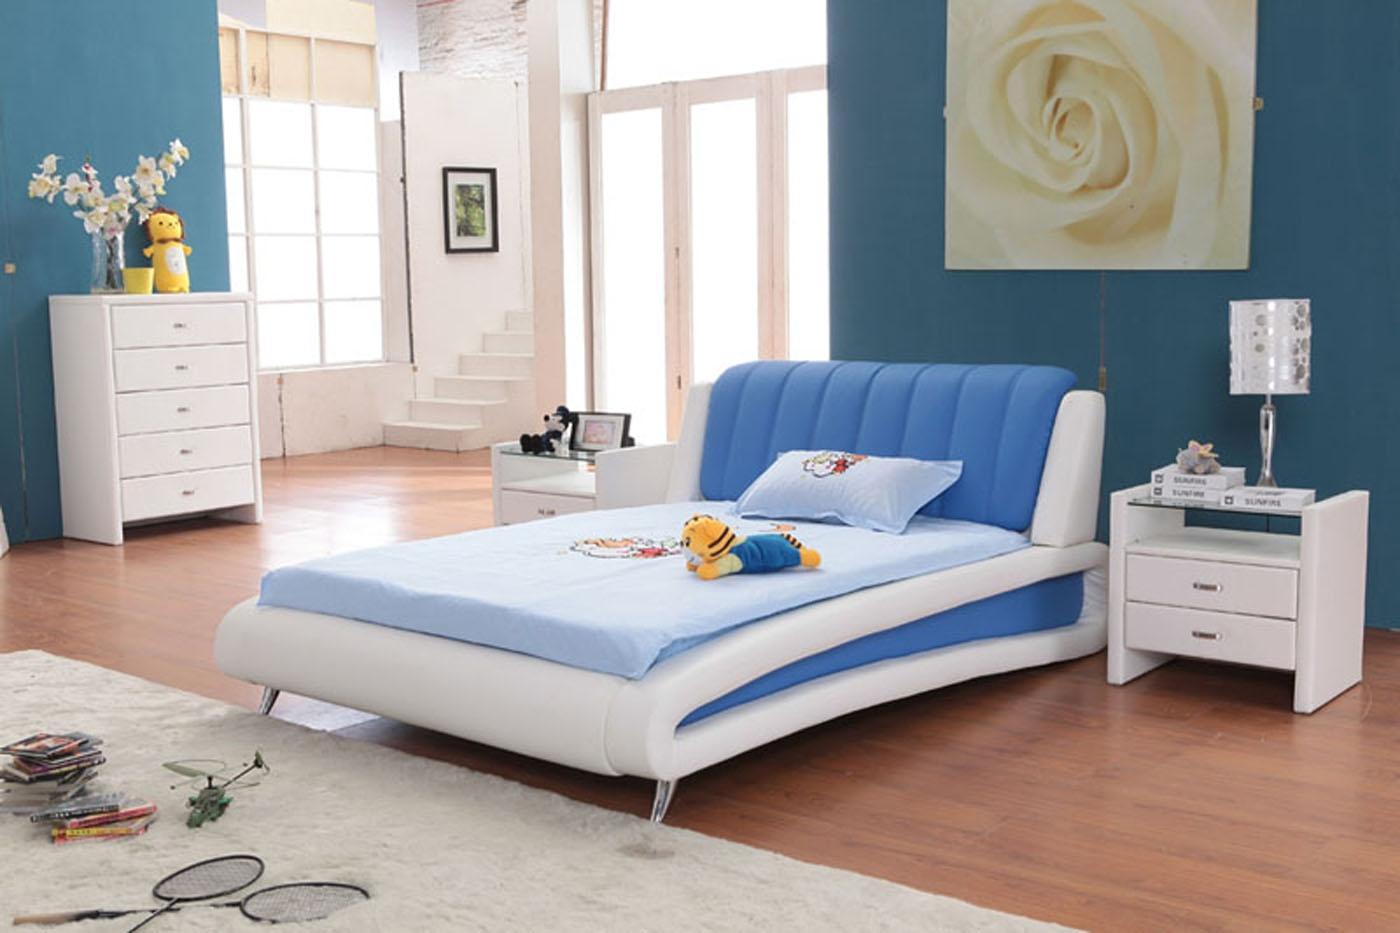 interior kamar tidur warna biru | interior rumah